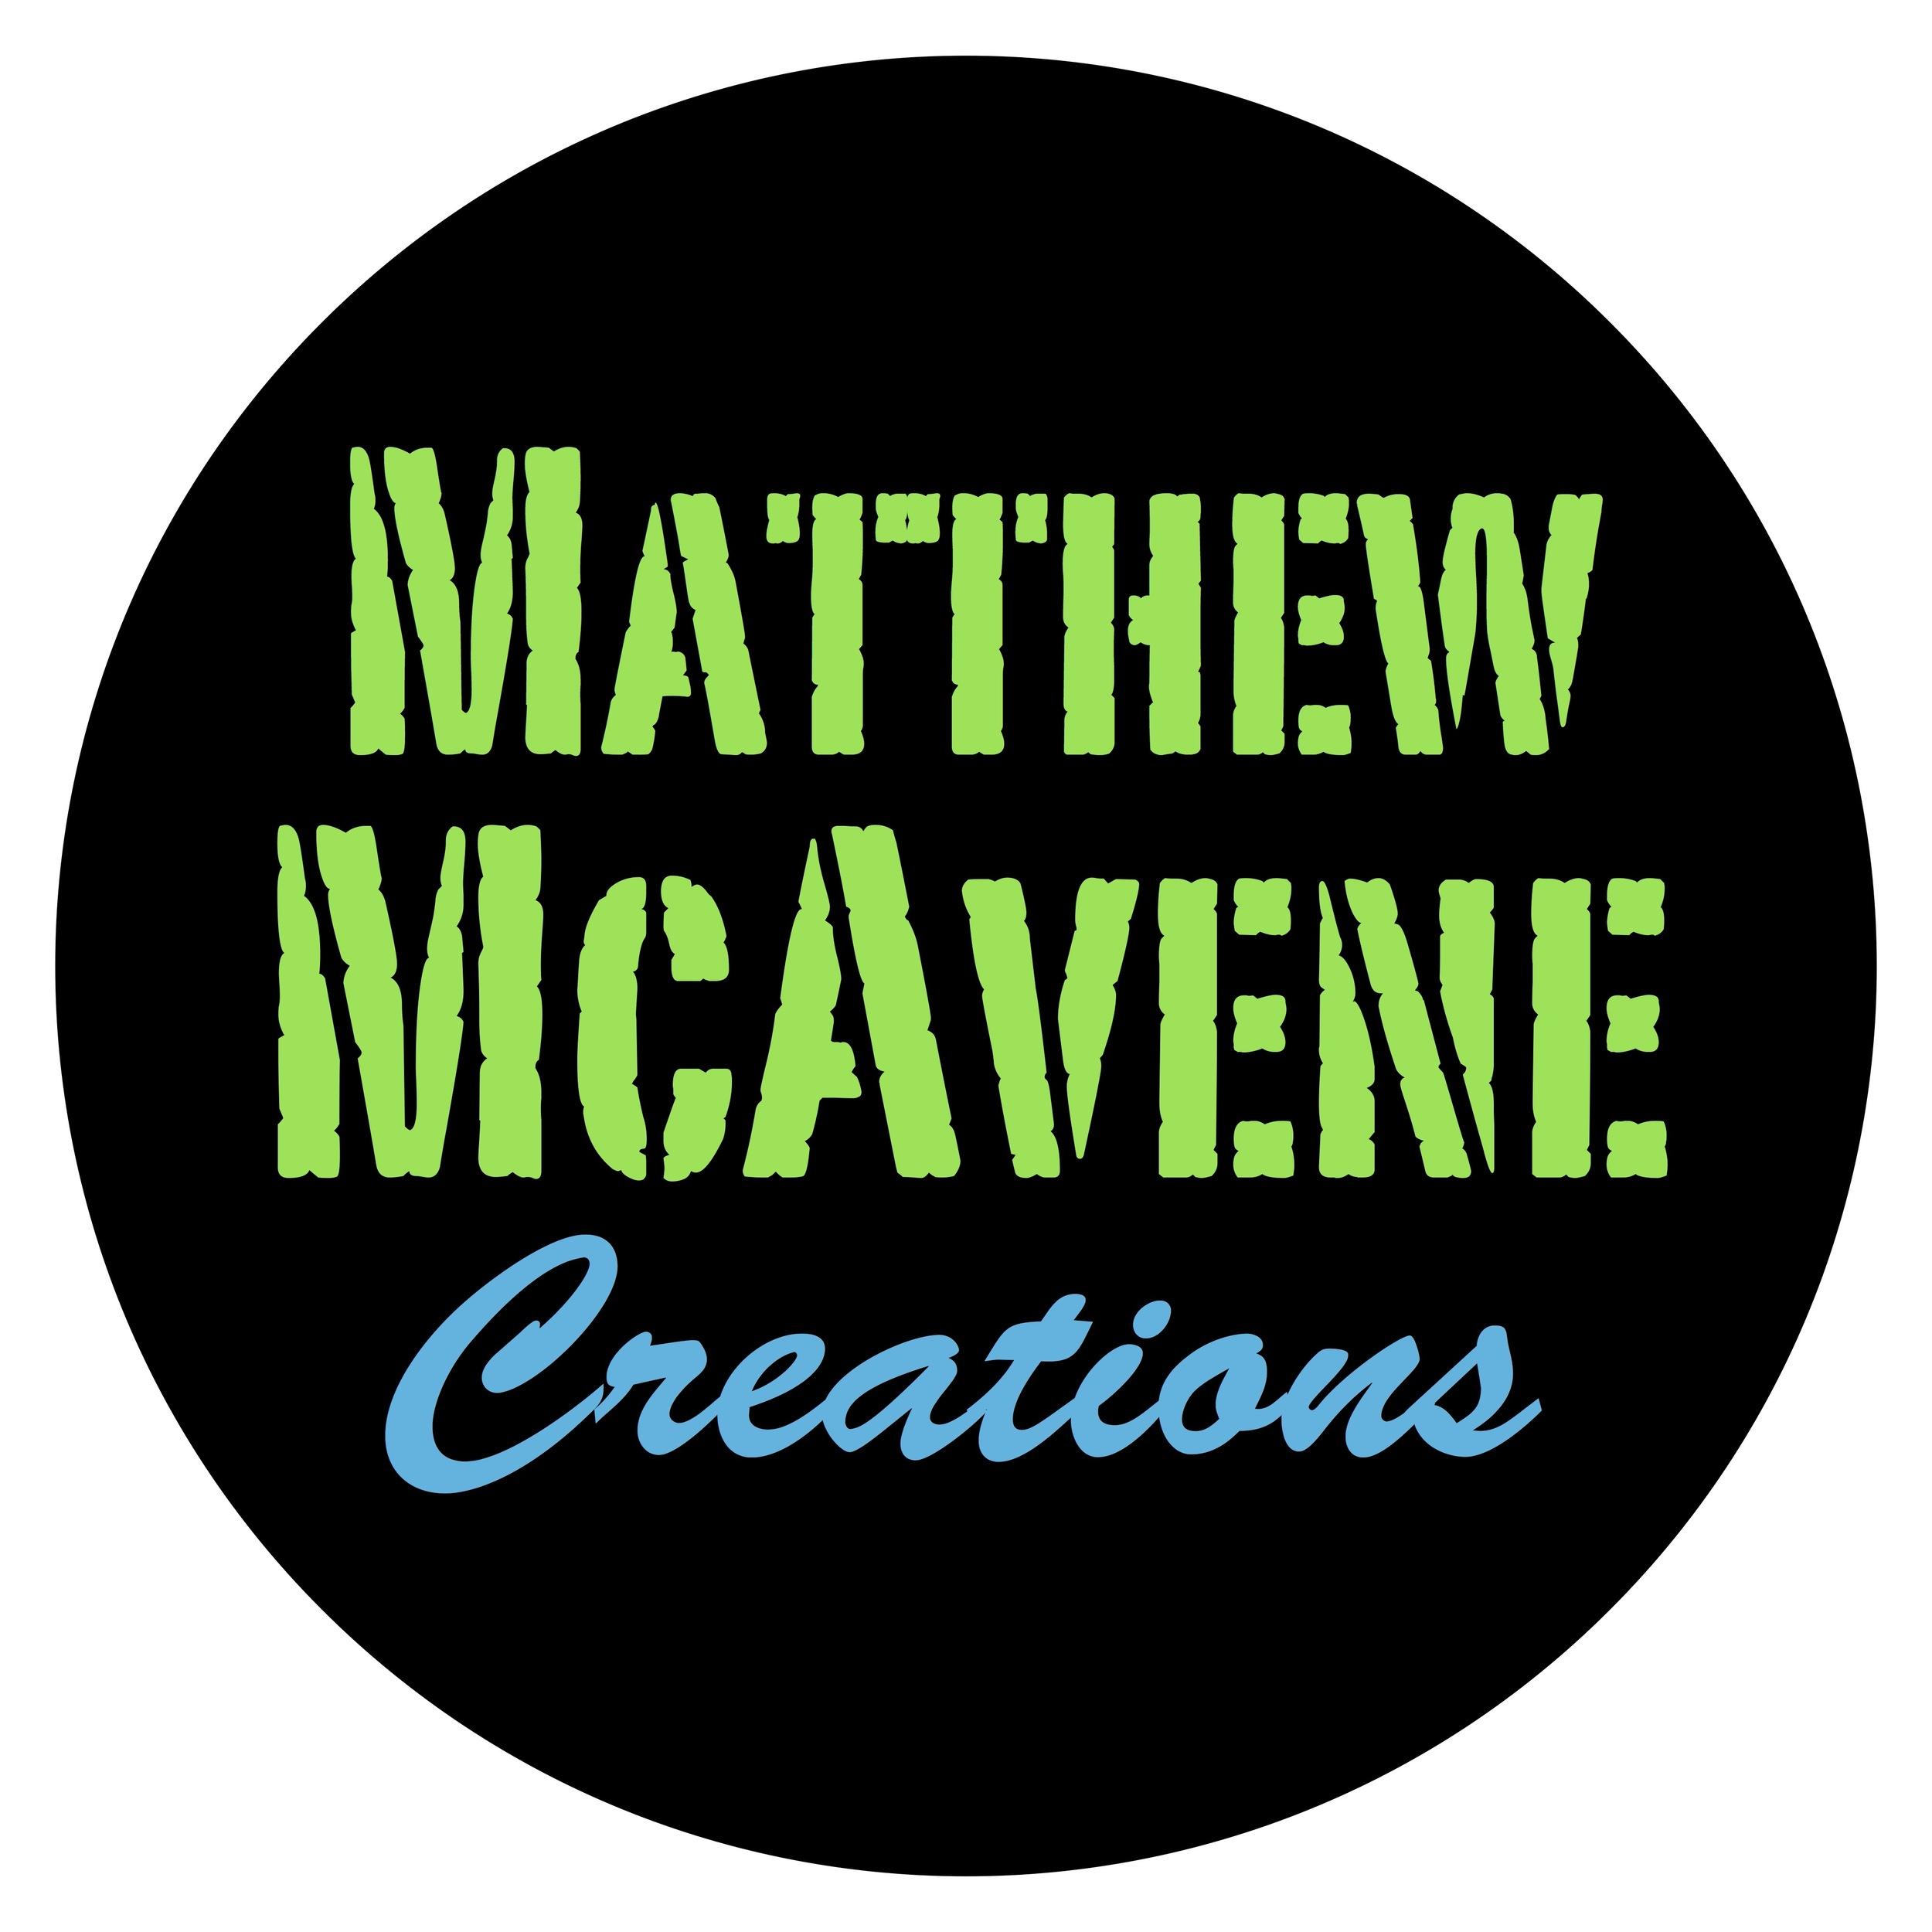 Matthew McAvene Creations Logo (1) copy.jpg